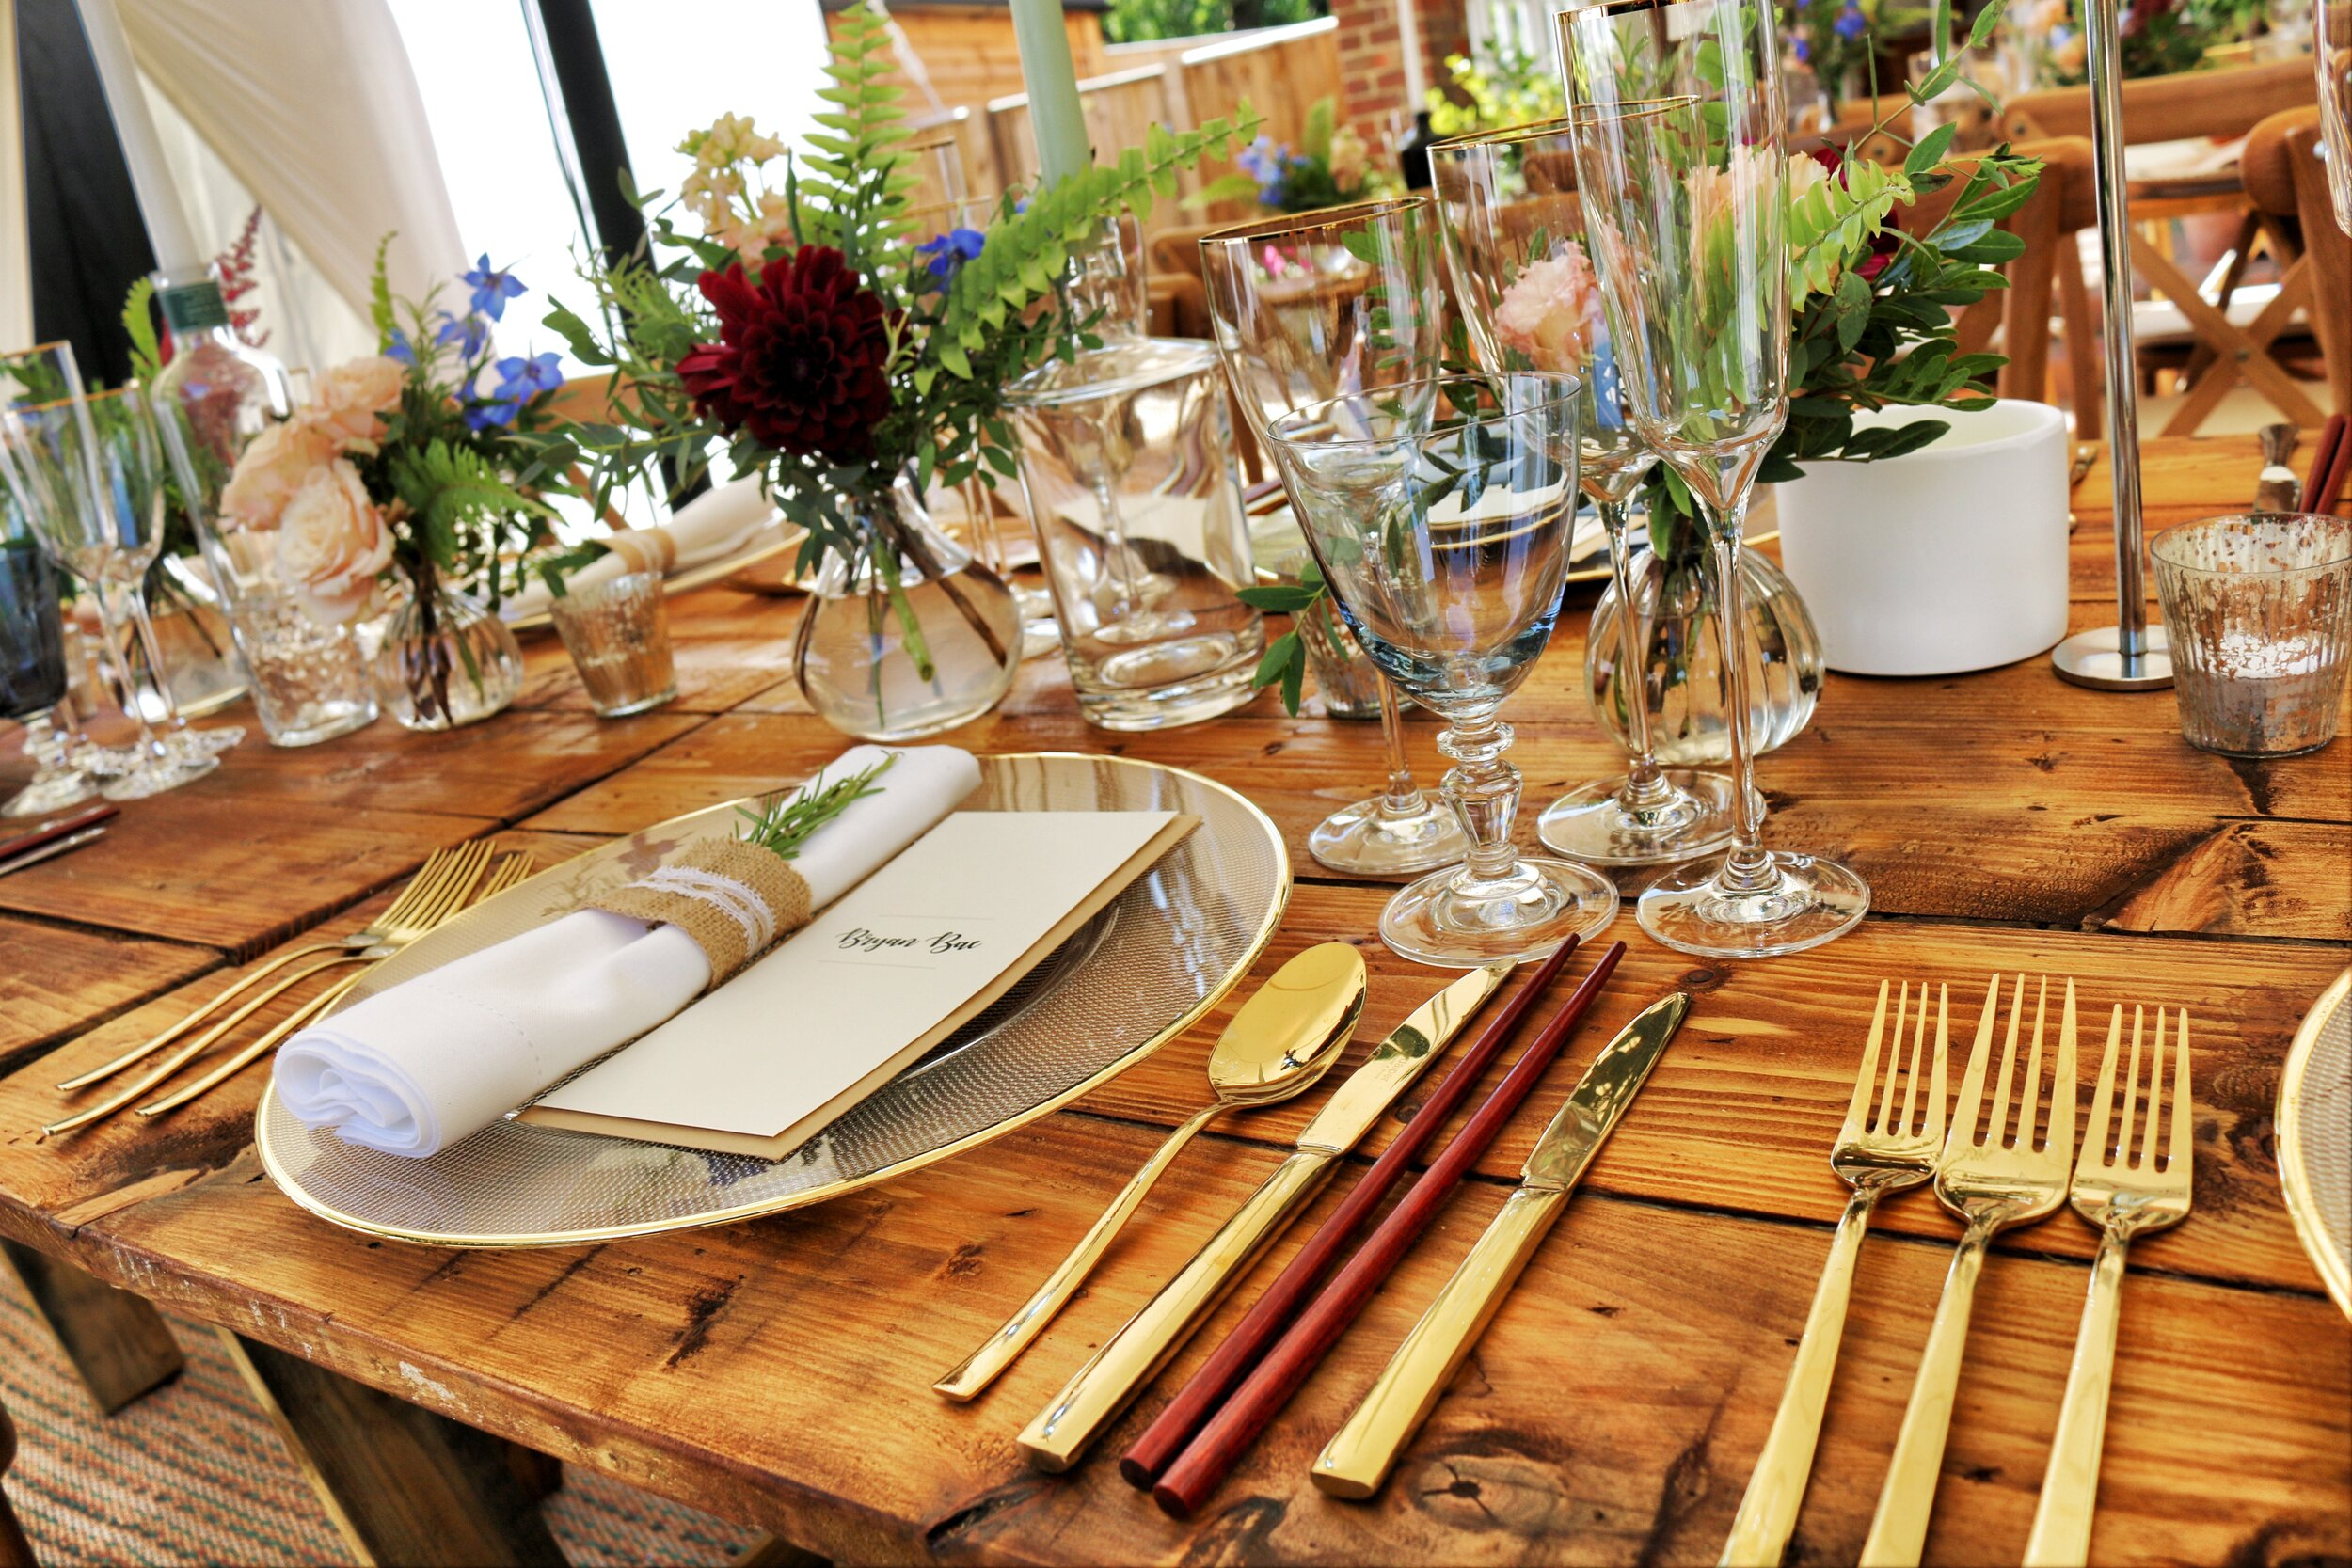 banquet-catering-celebration-1395964.jpg